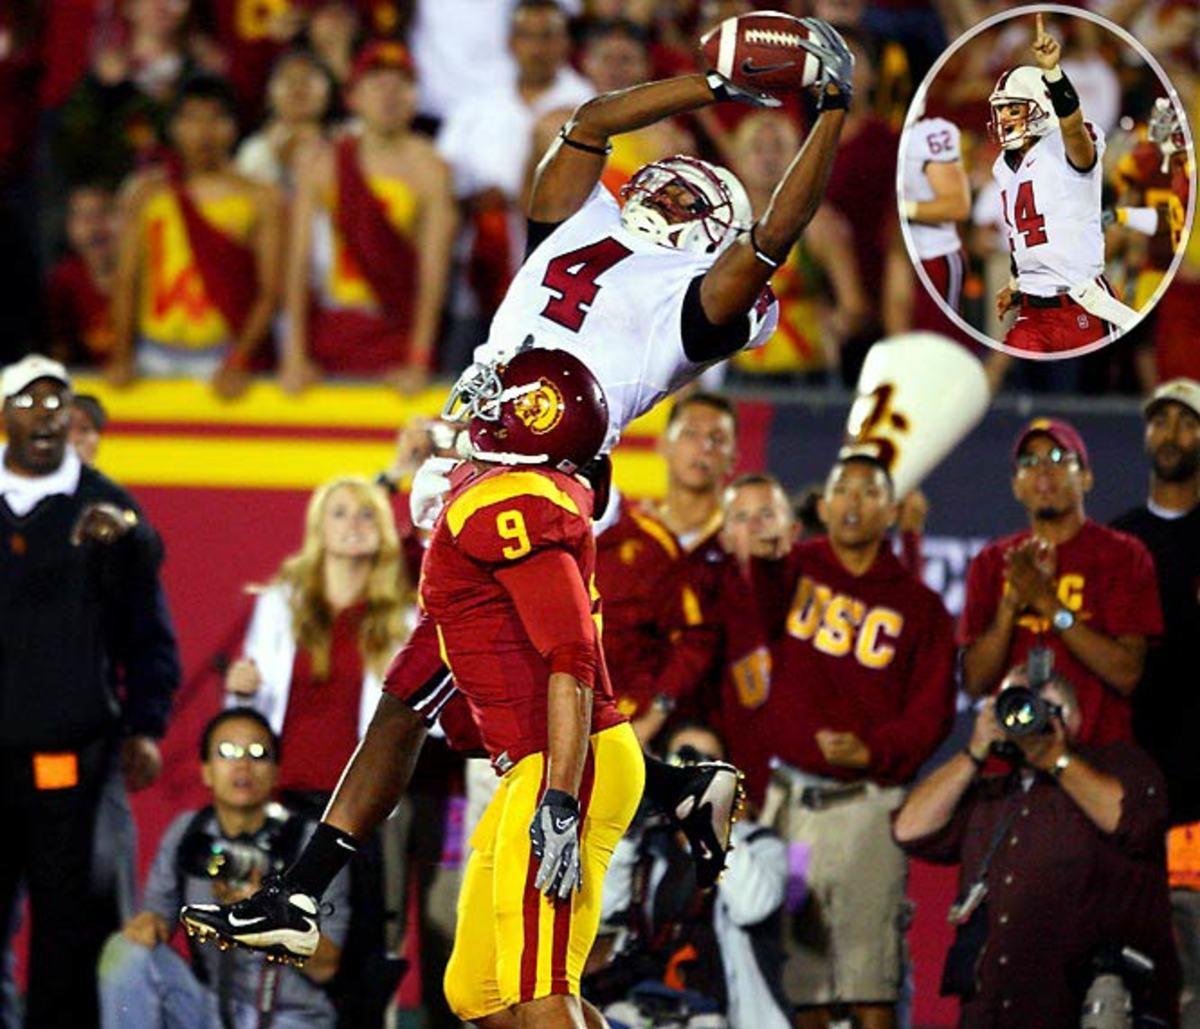 Stanford 24, USC 23